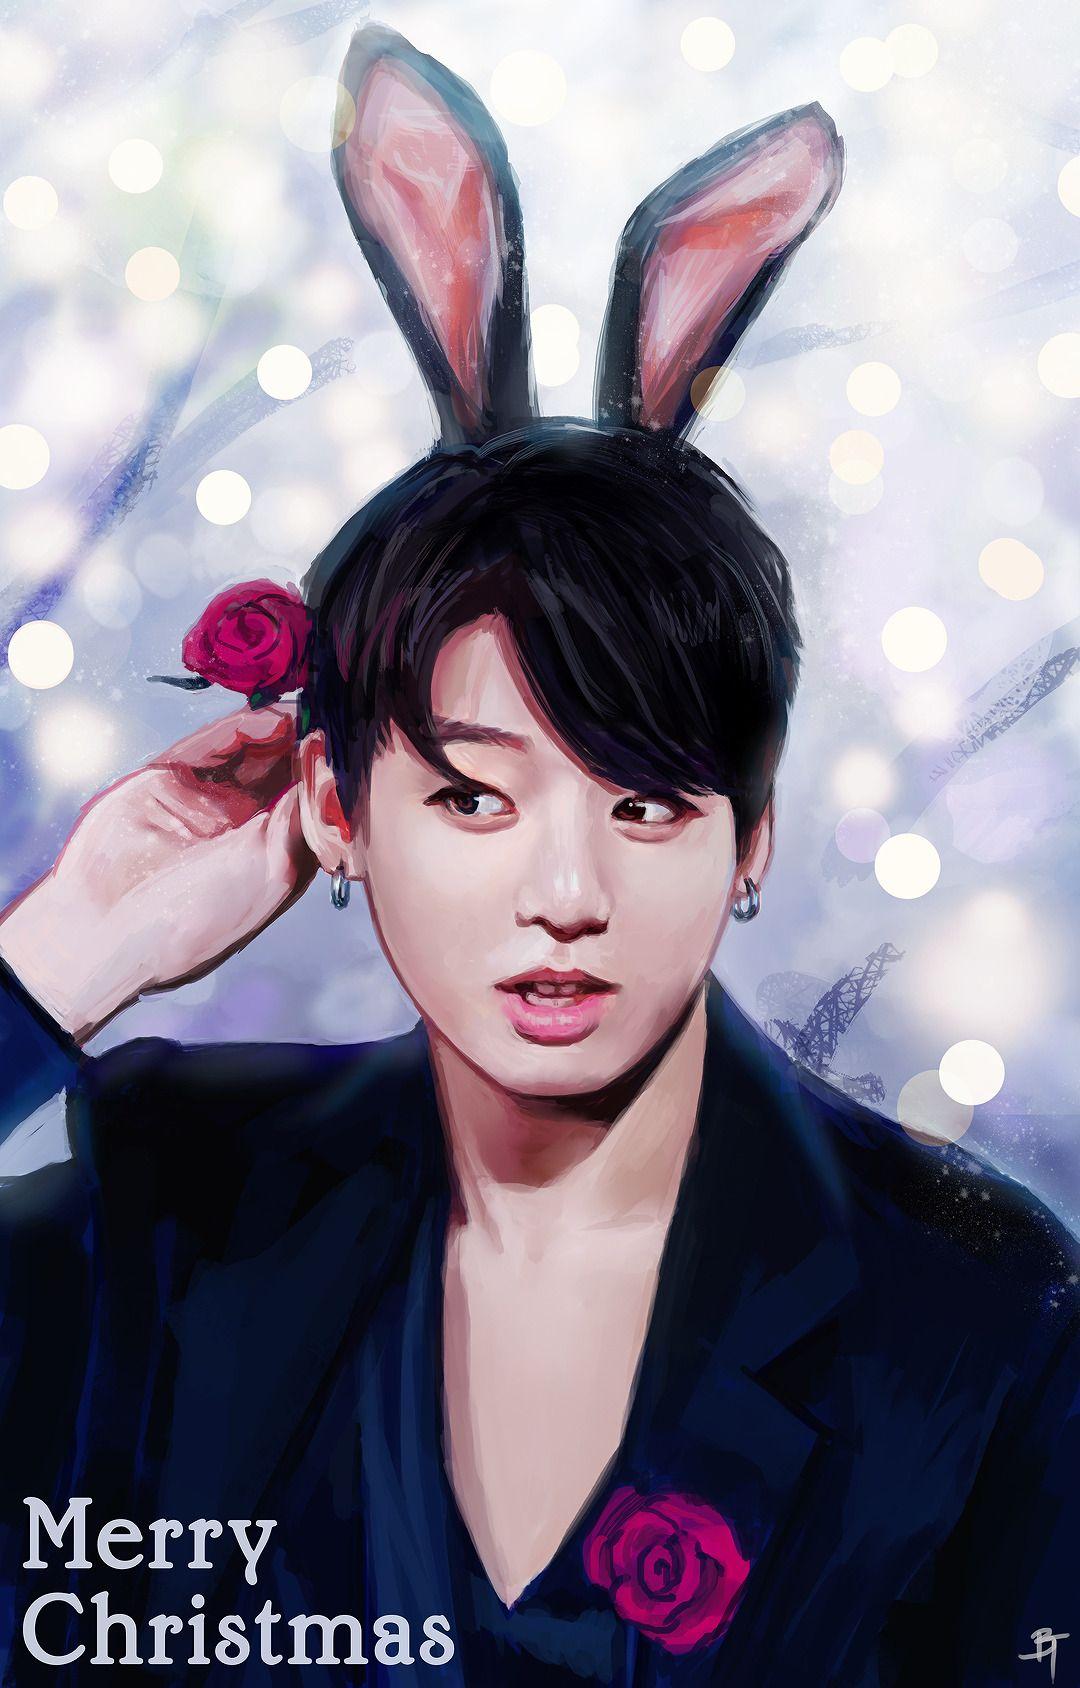 Jungkook Fanart ♥ BTS Fanart Pinterest Fanart, BTS